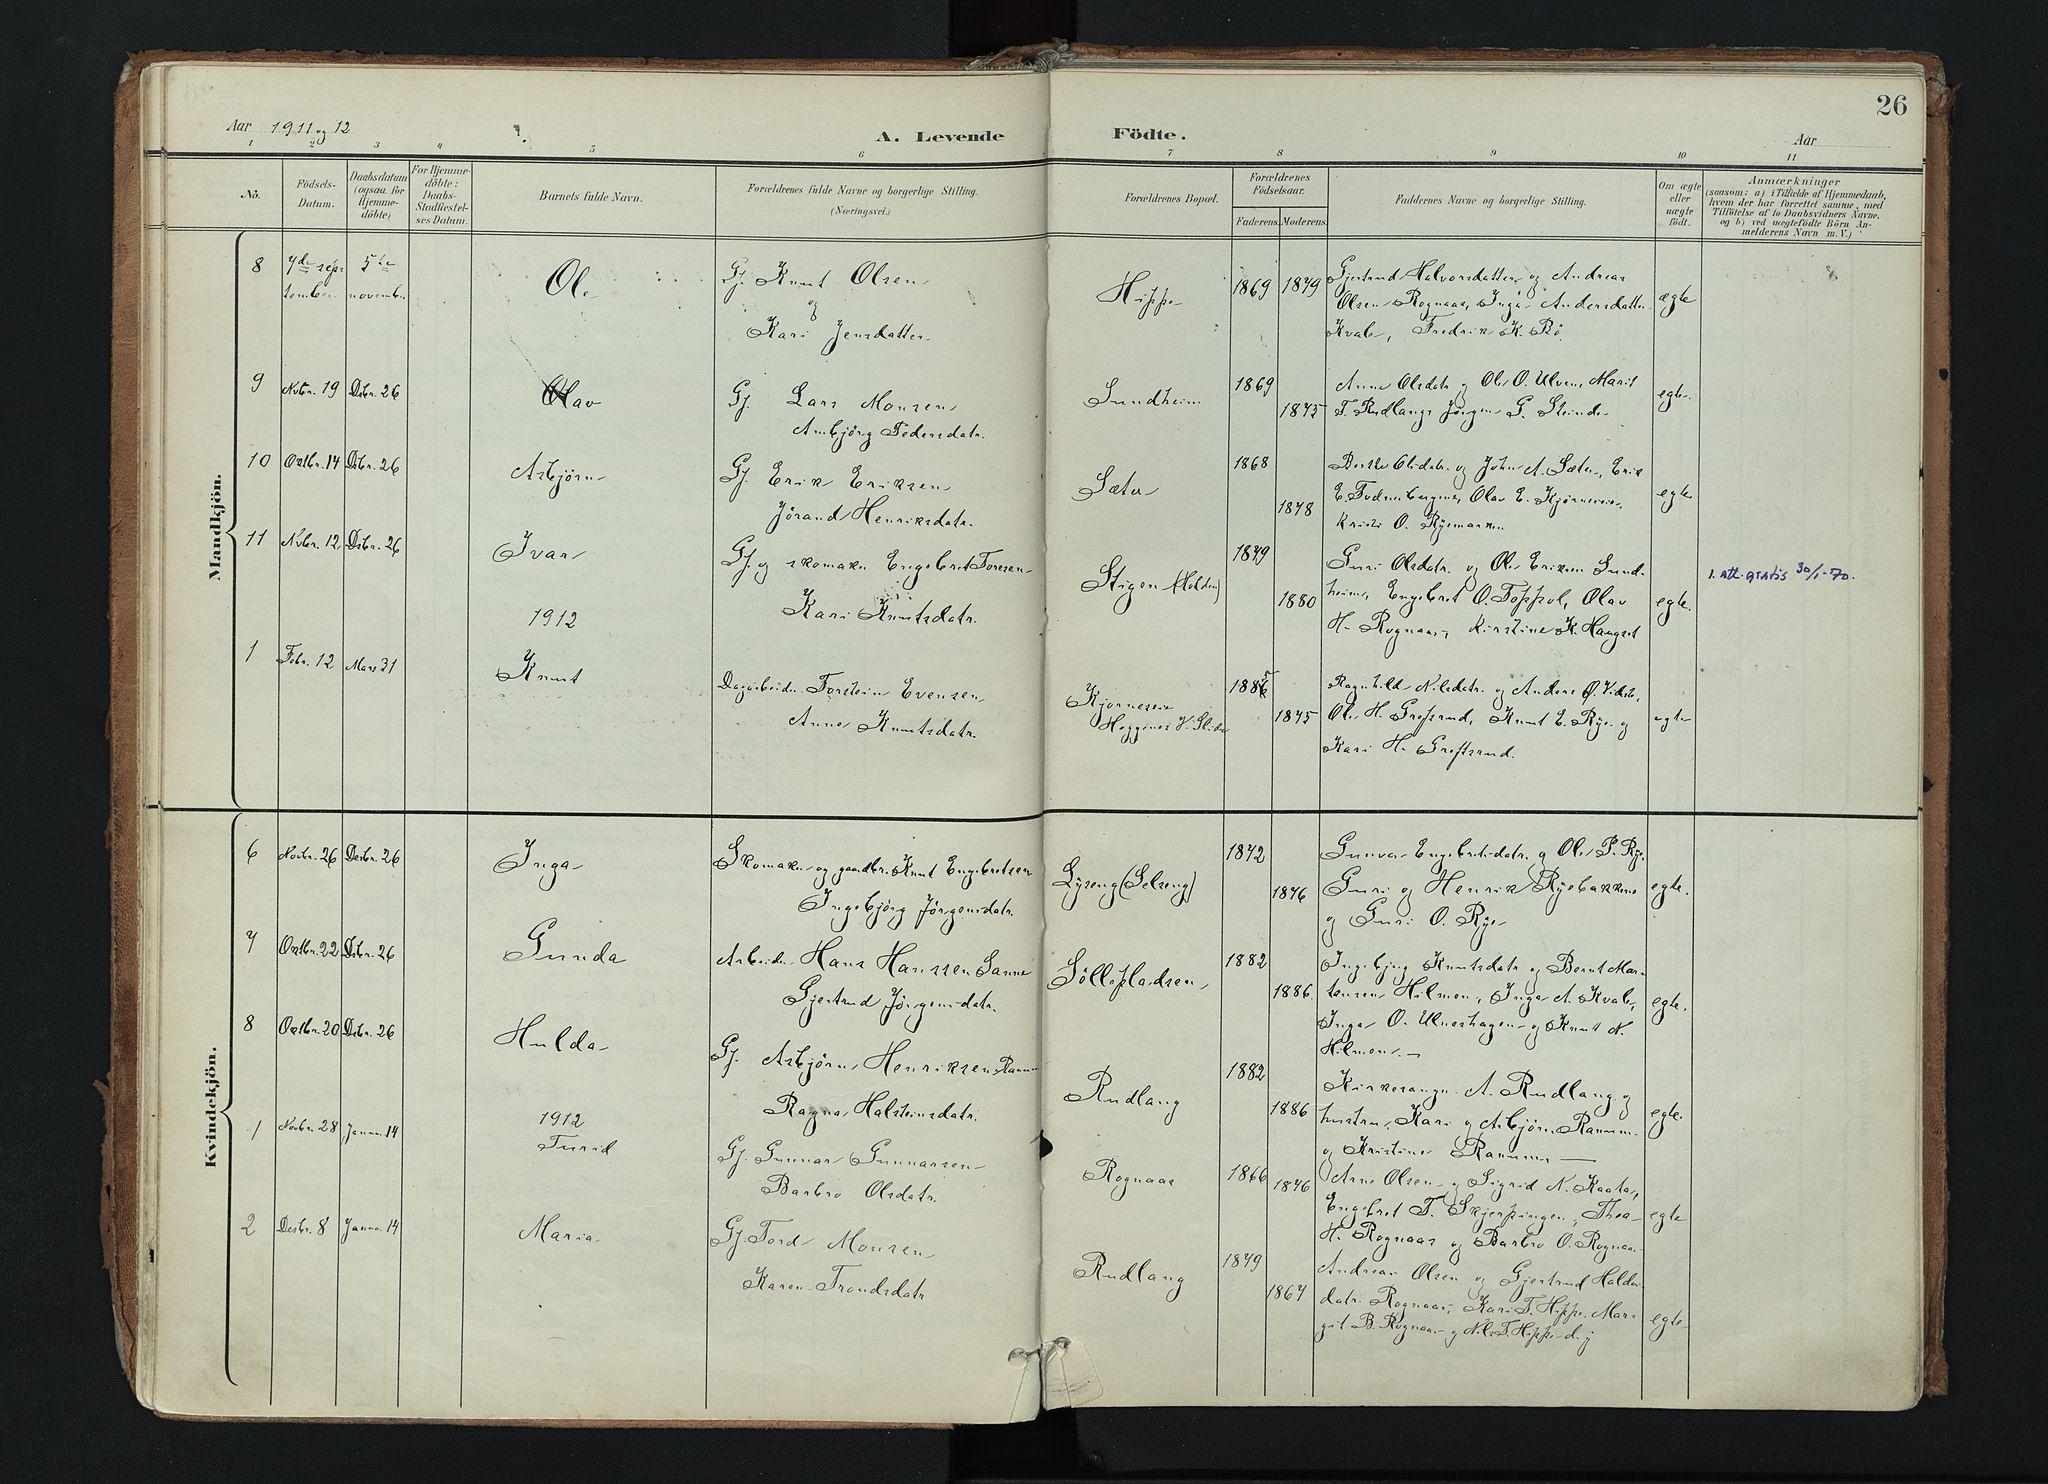 SAH, Nord-Aurdal prestekontor, Ministerialbok nr. 17, 1897-1926, s. 26